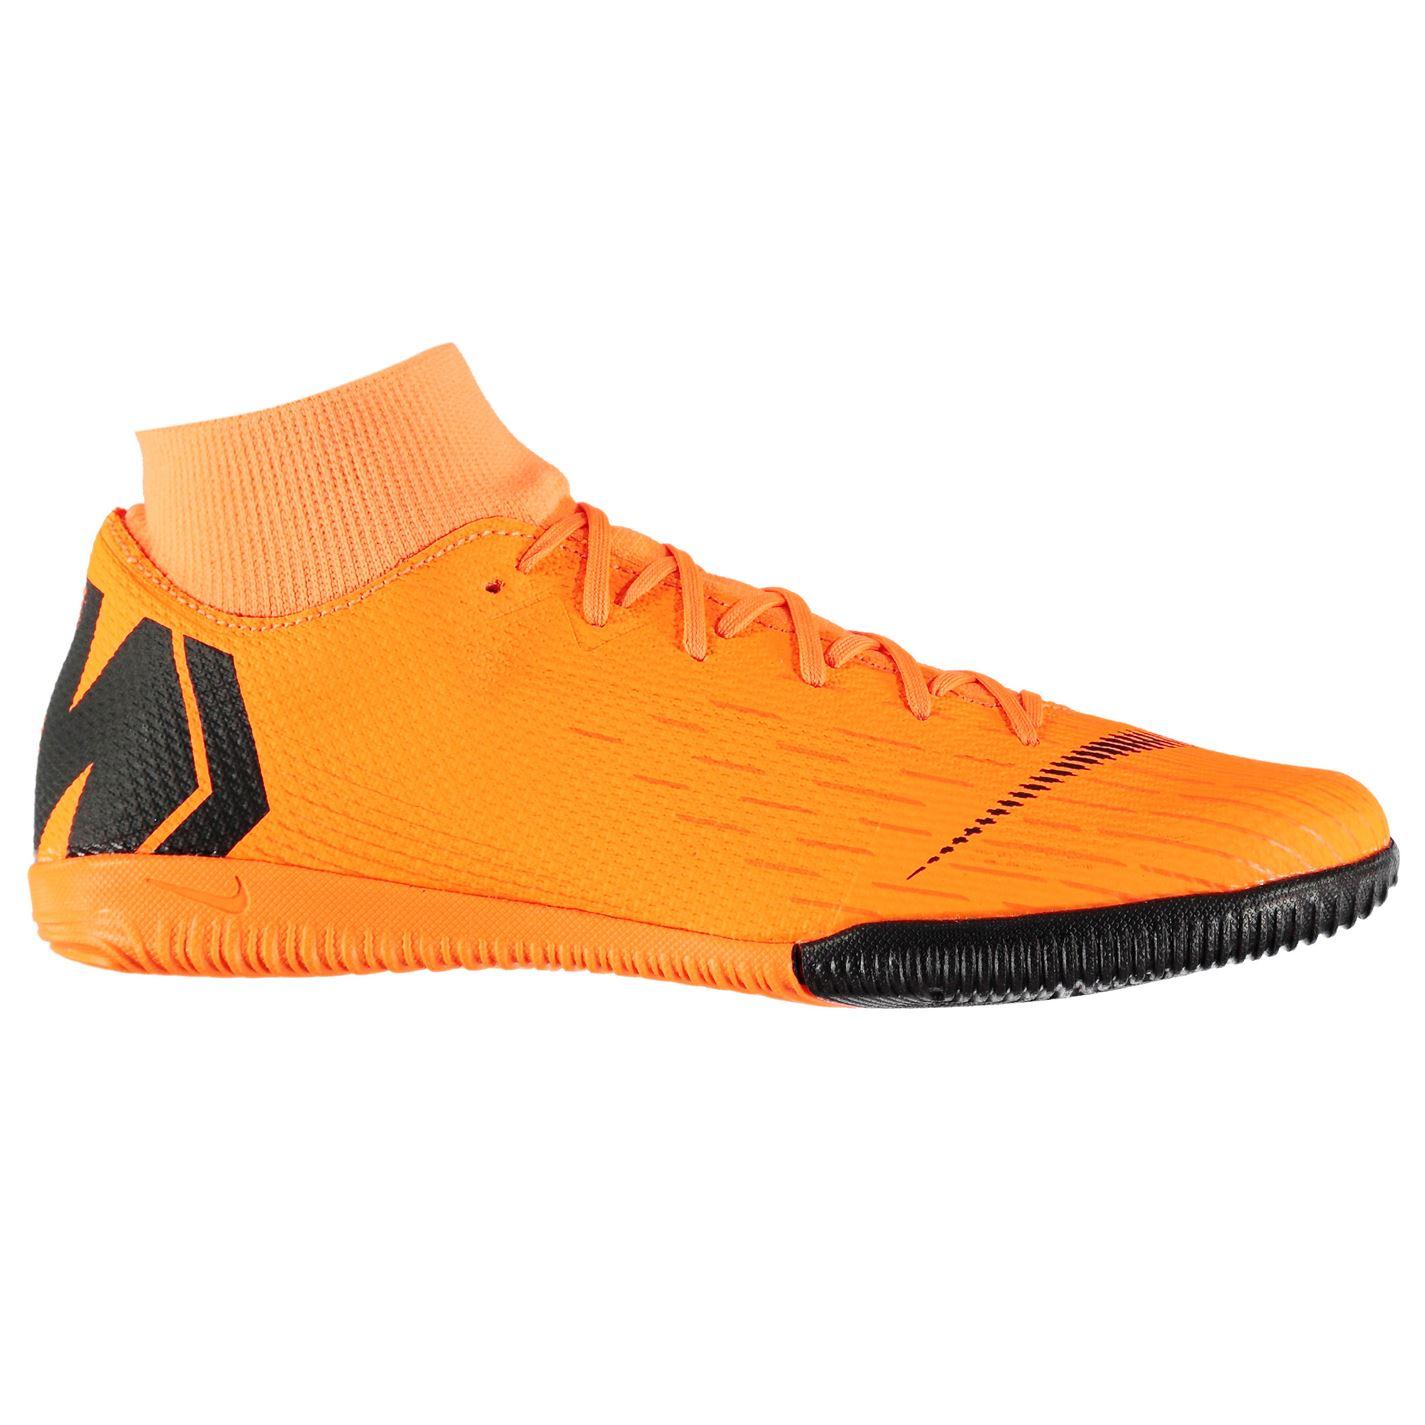 Nike Mercurial Superfly Academy Mens Indoor Football Trainers